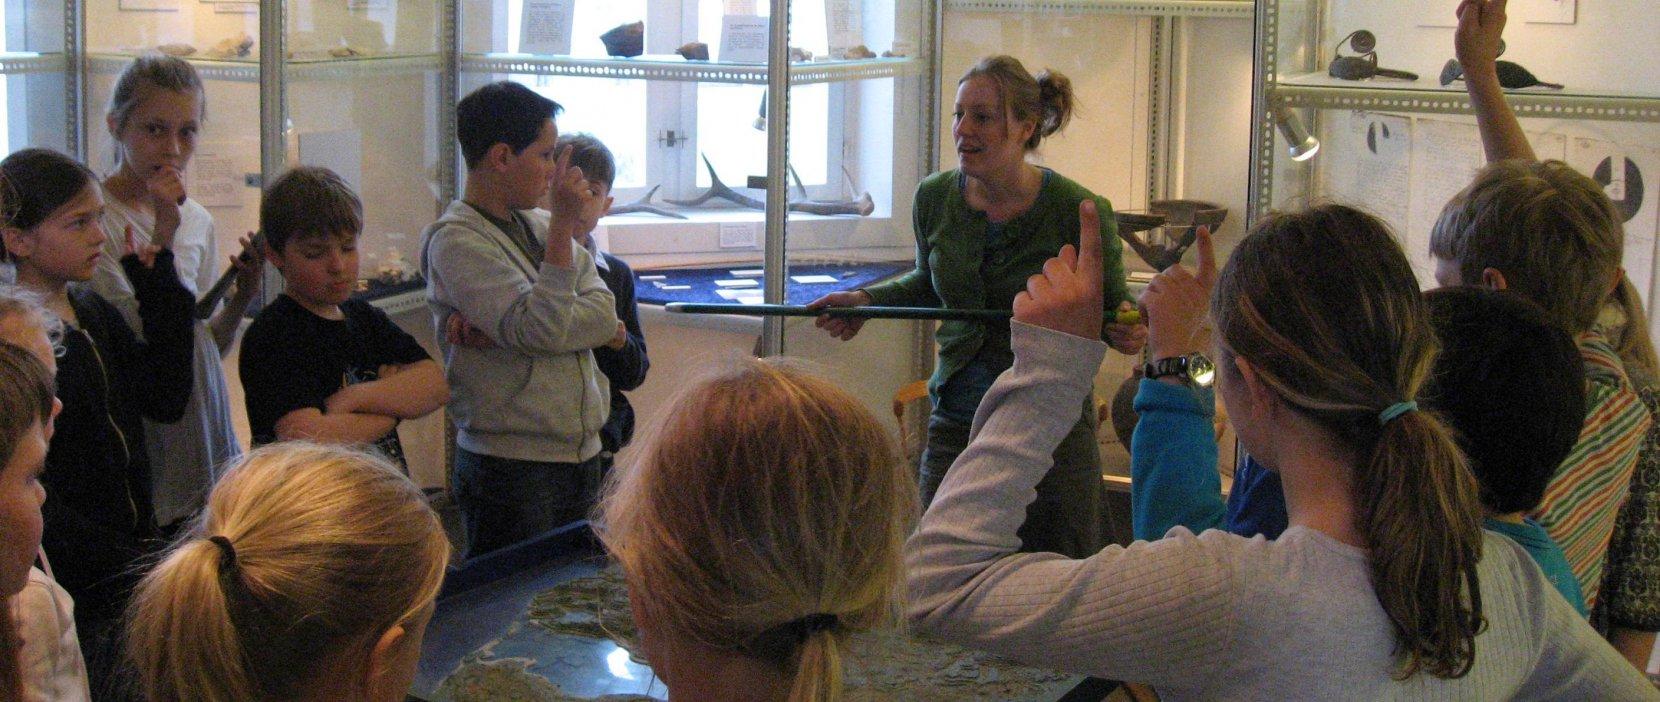 Skoletjeneste på Vedbækfundene